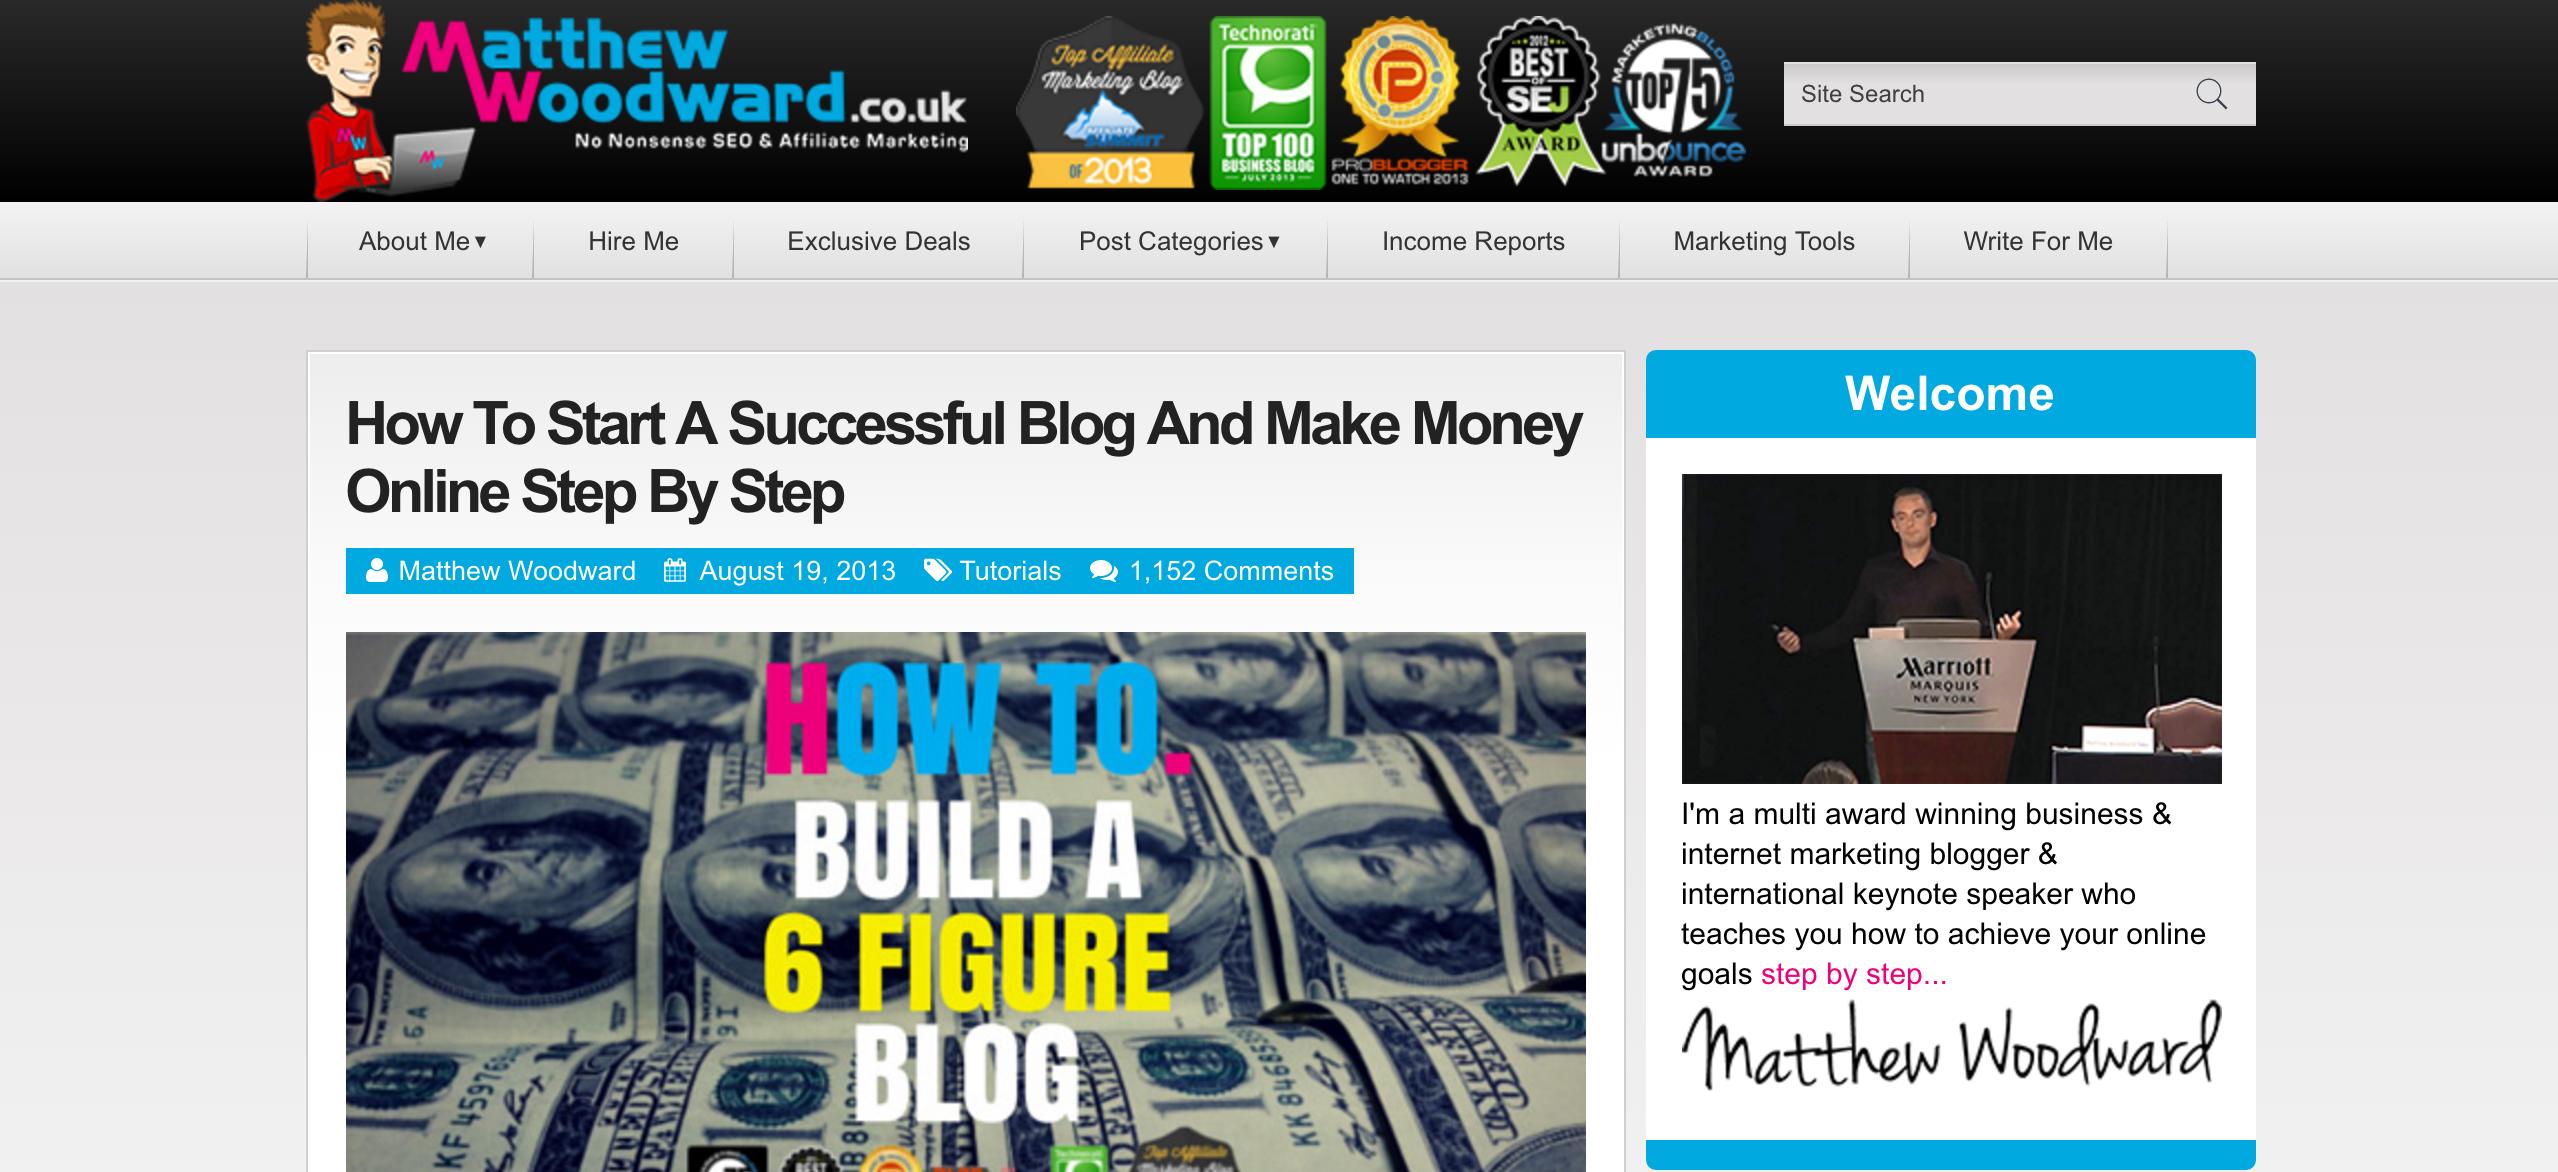 Matthew Woodward Affiliate Marketing and SEO Blog